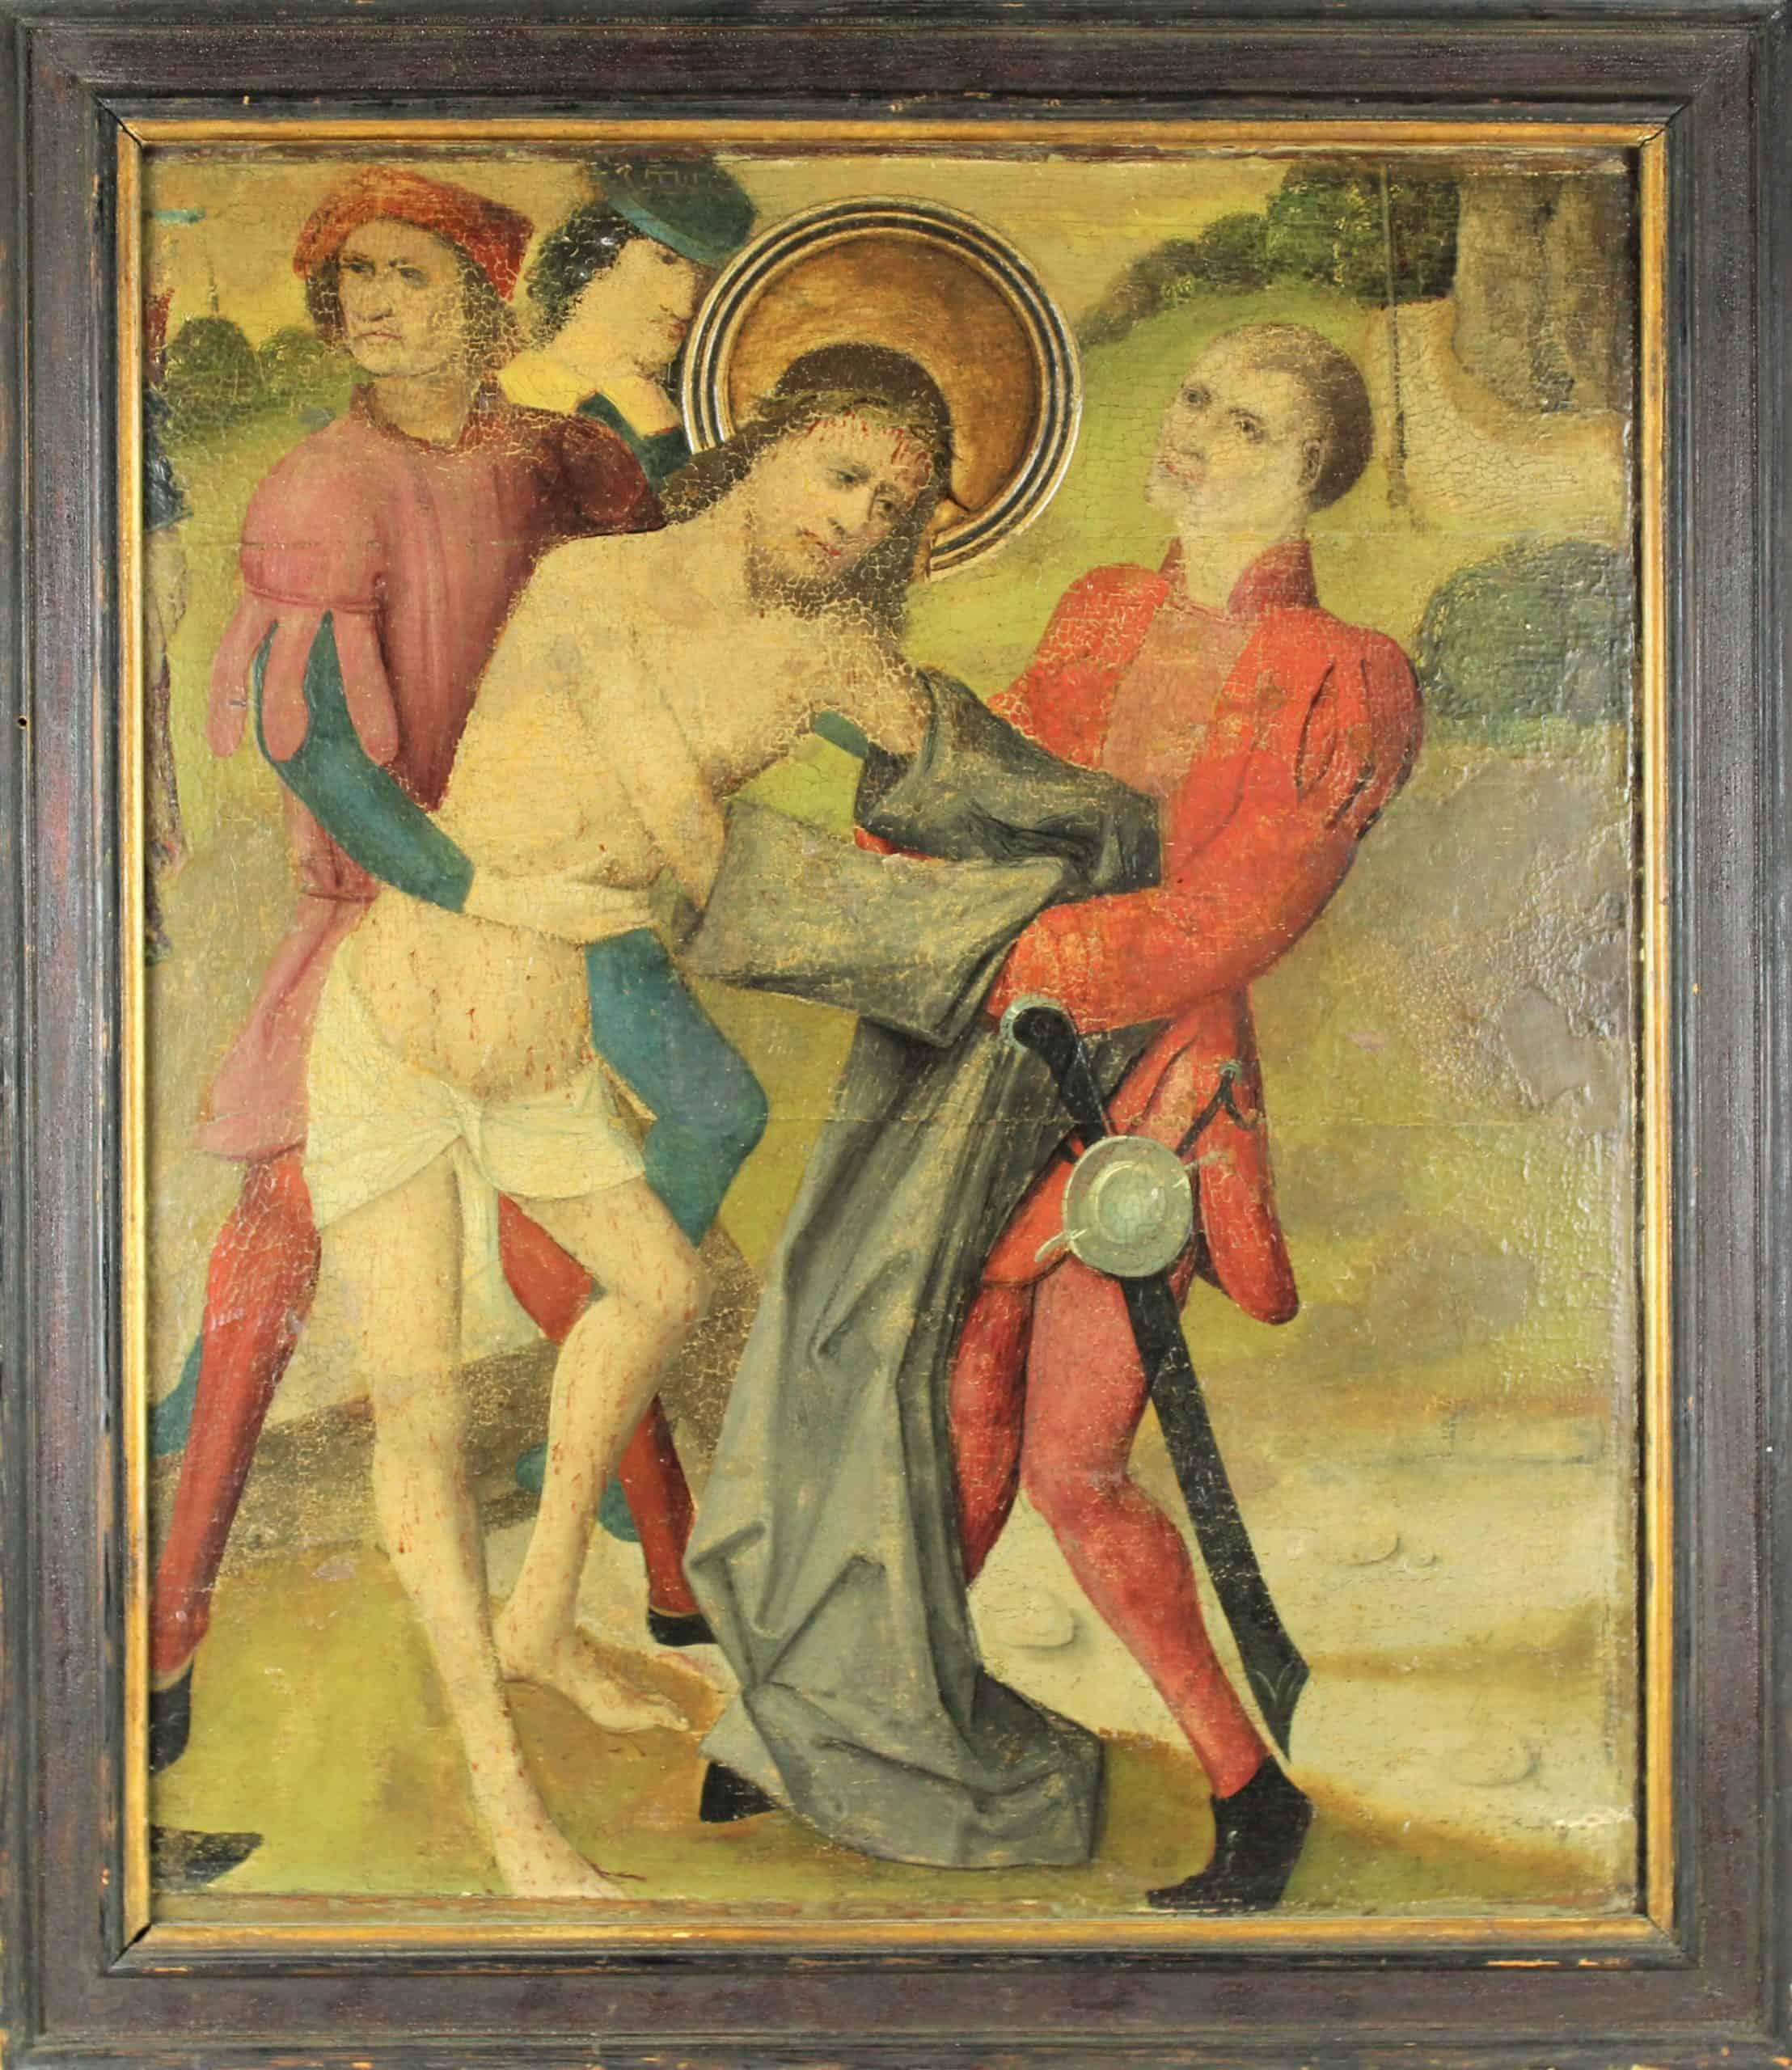 17th C. European Old Master Oil on Panel